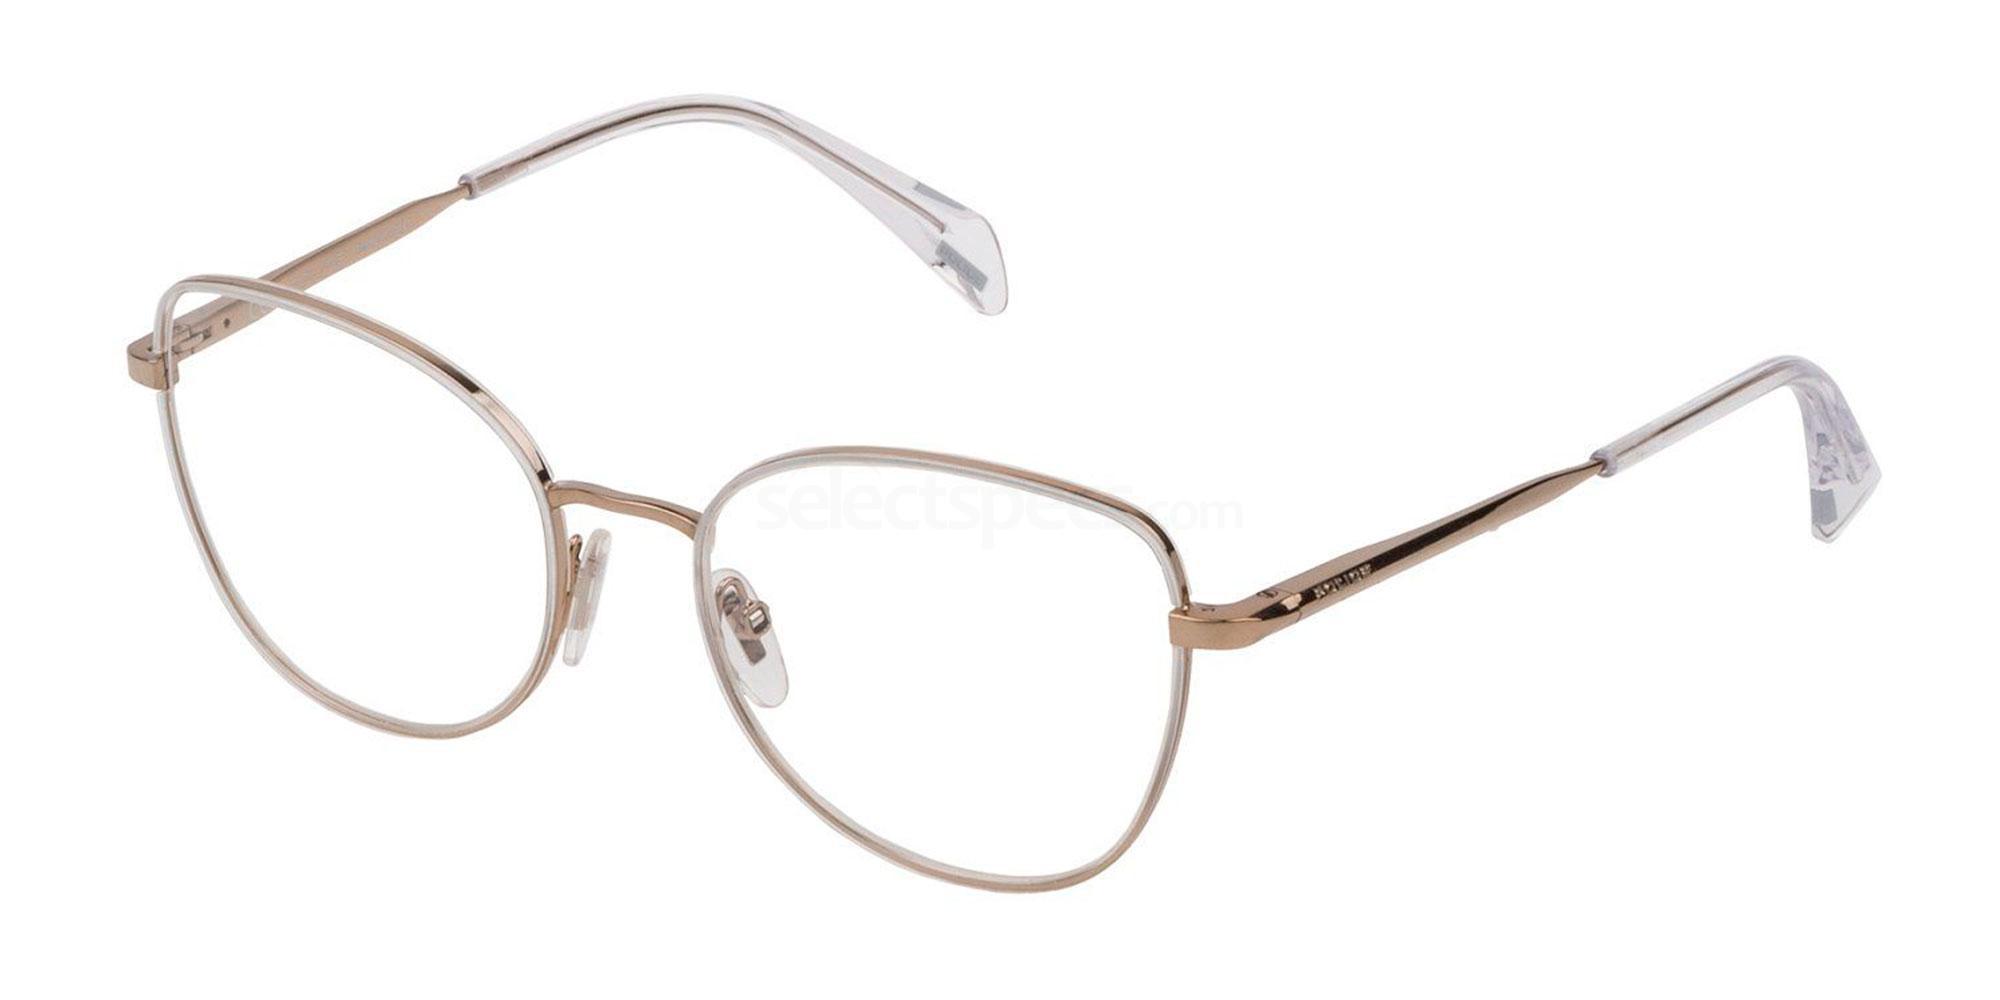 08FW VPL839 Glasses, Police